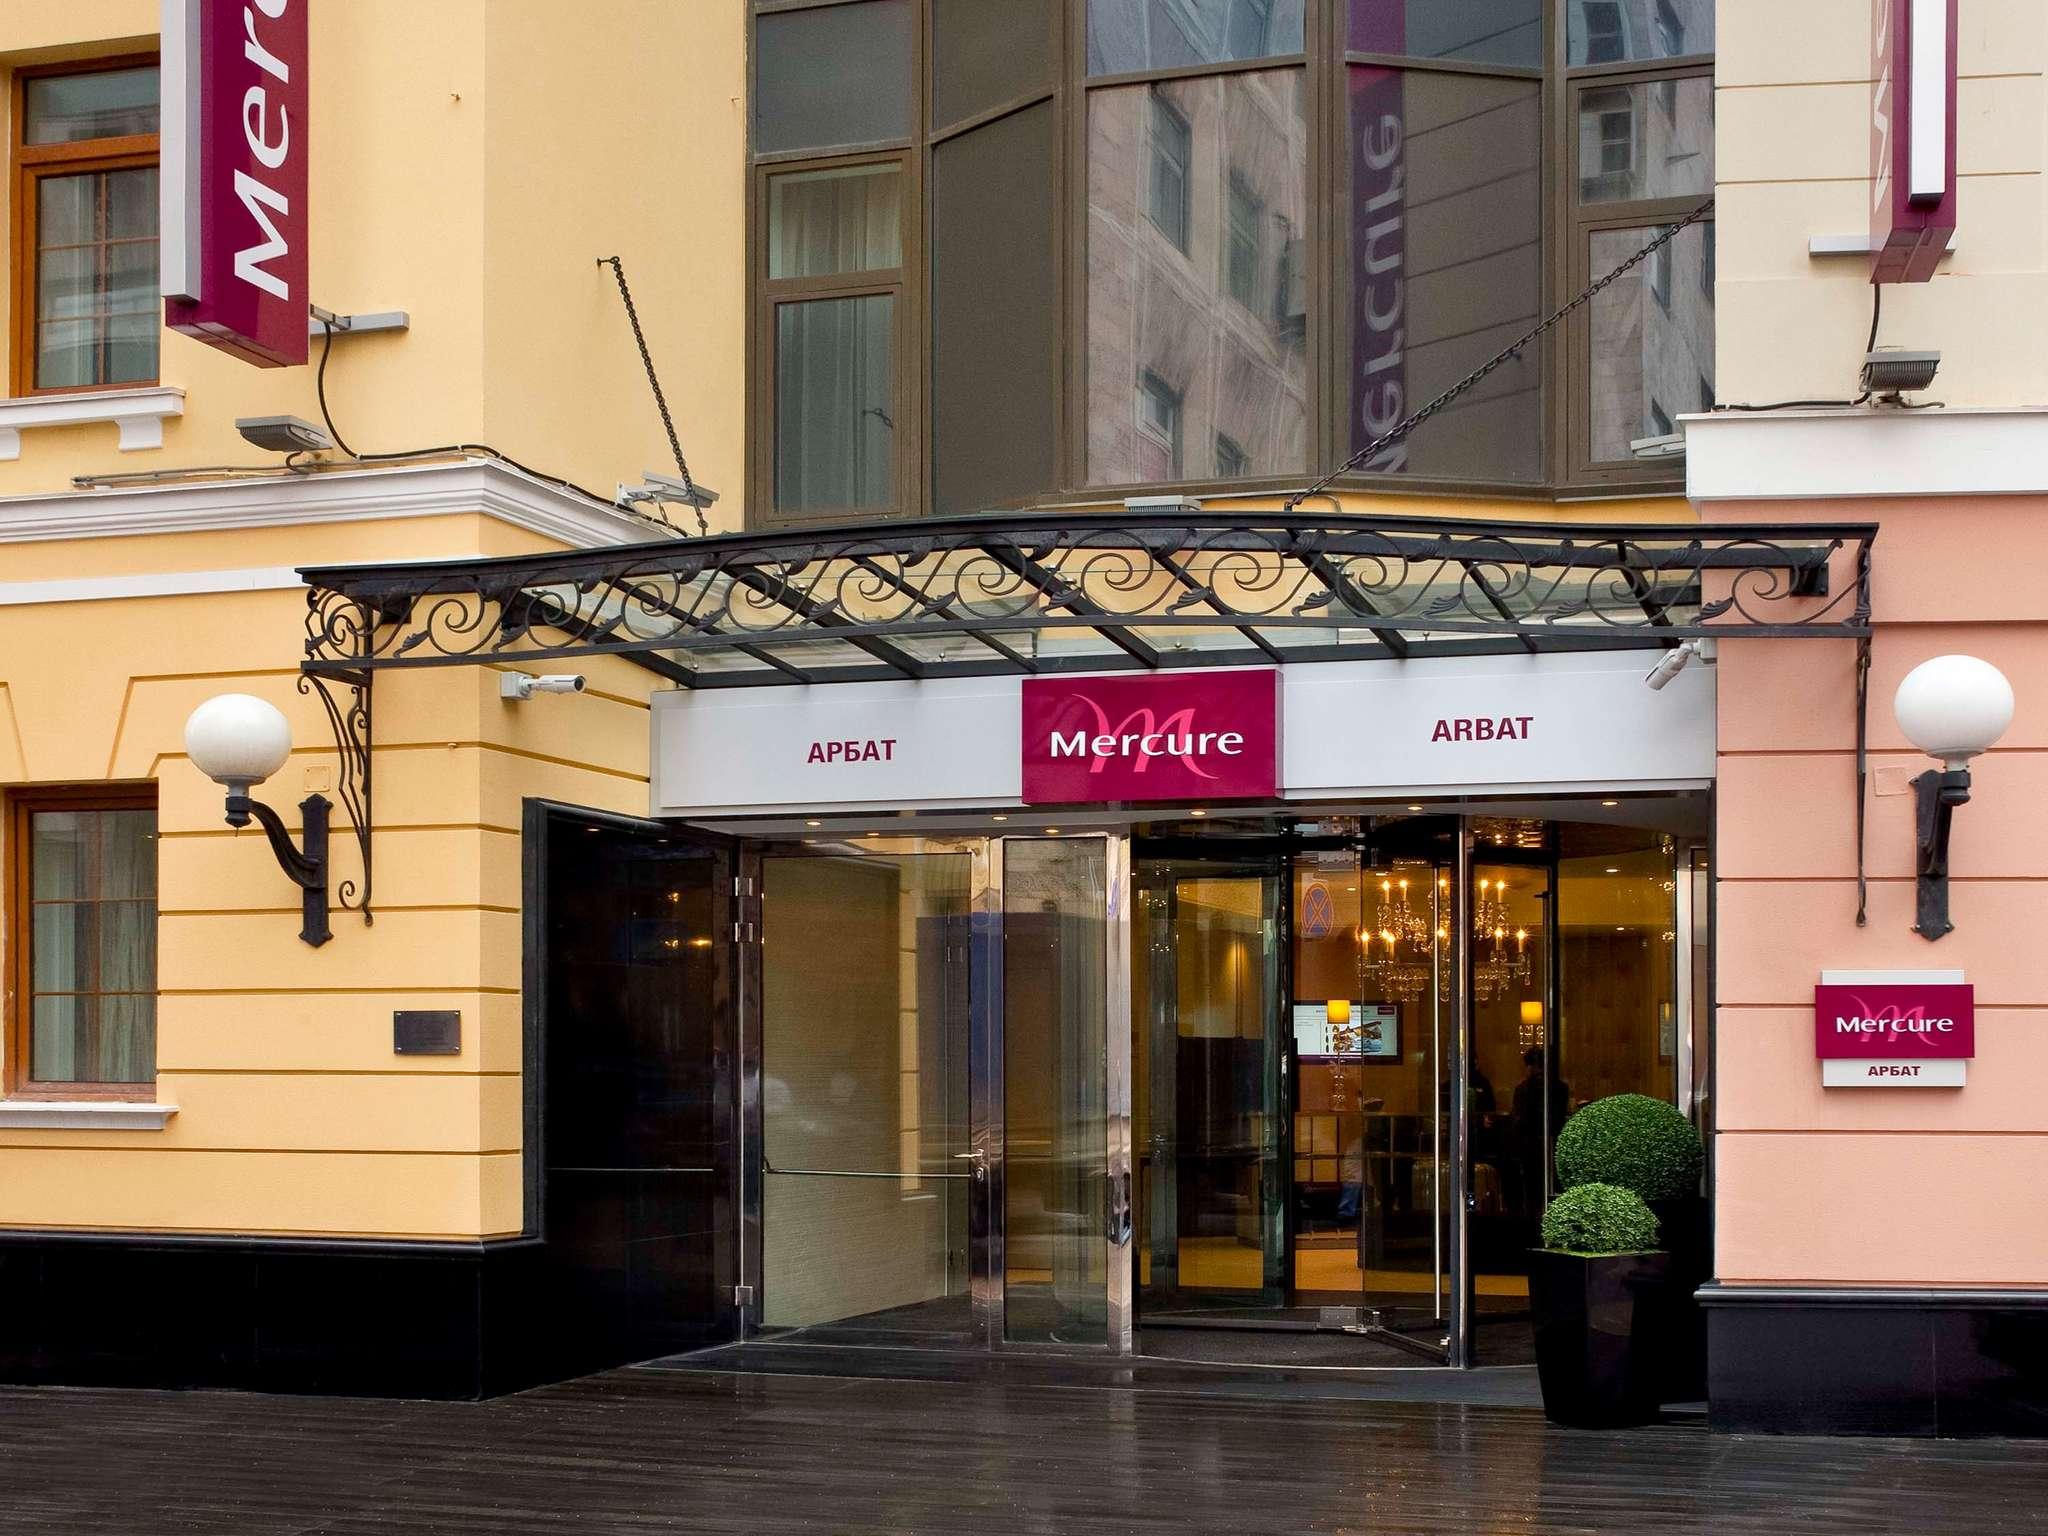 Hôtel - Mercure Arbat Moscow